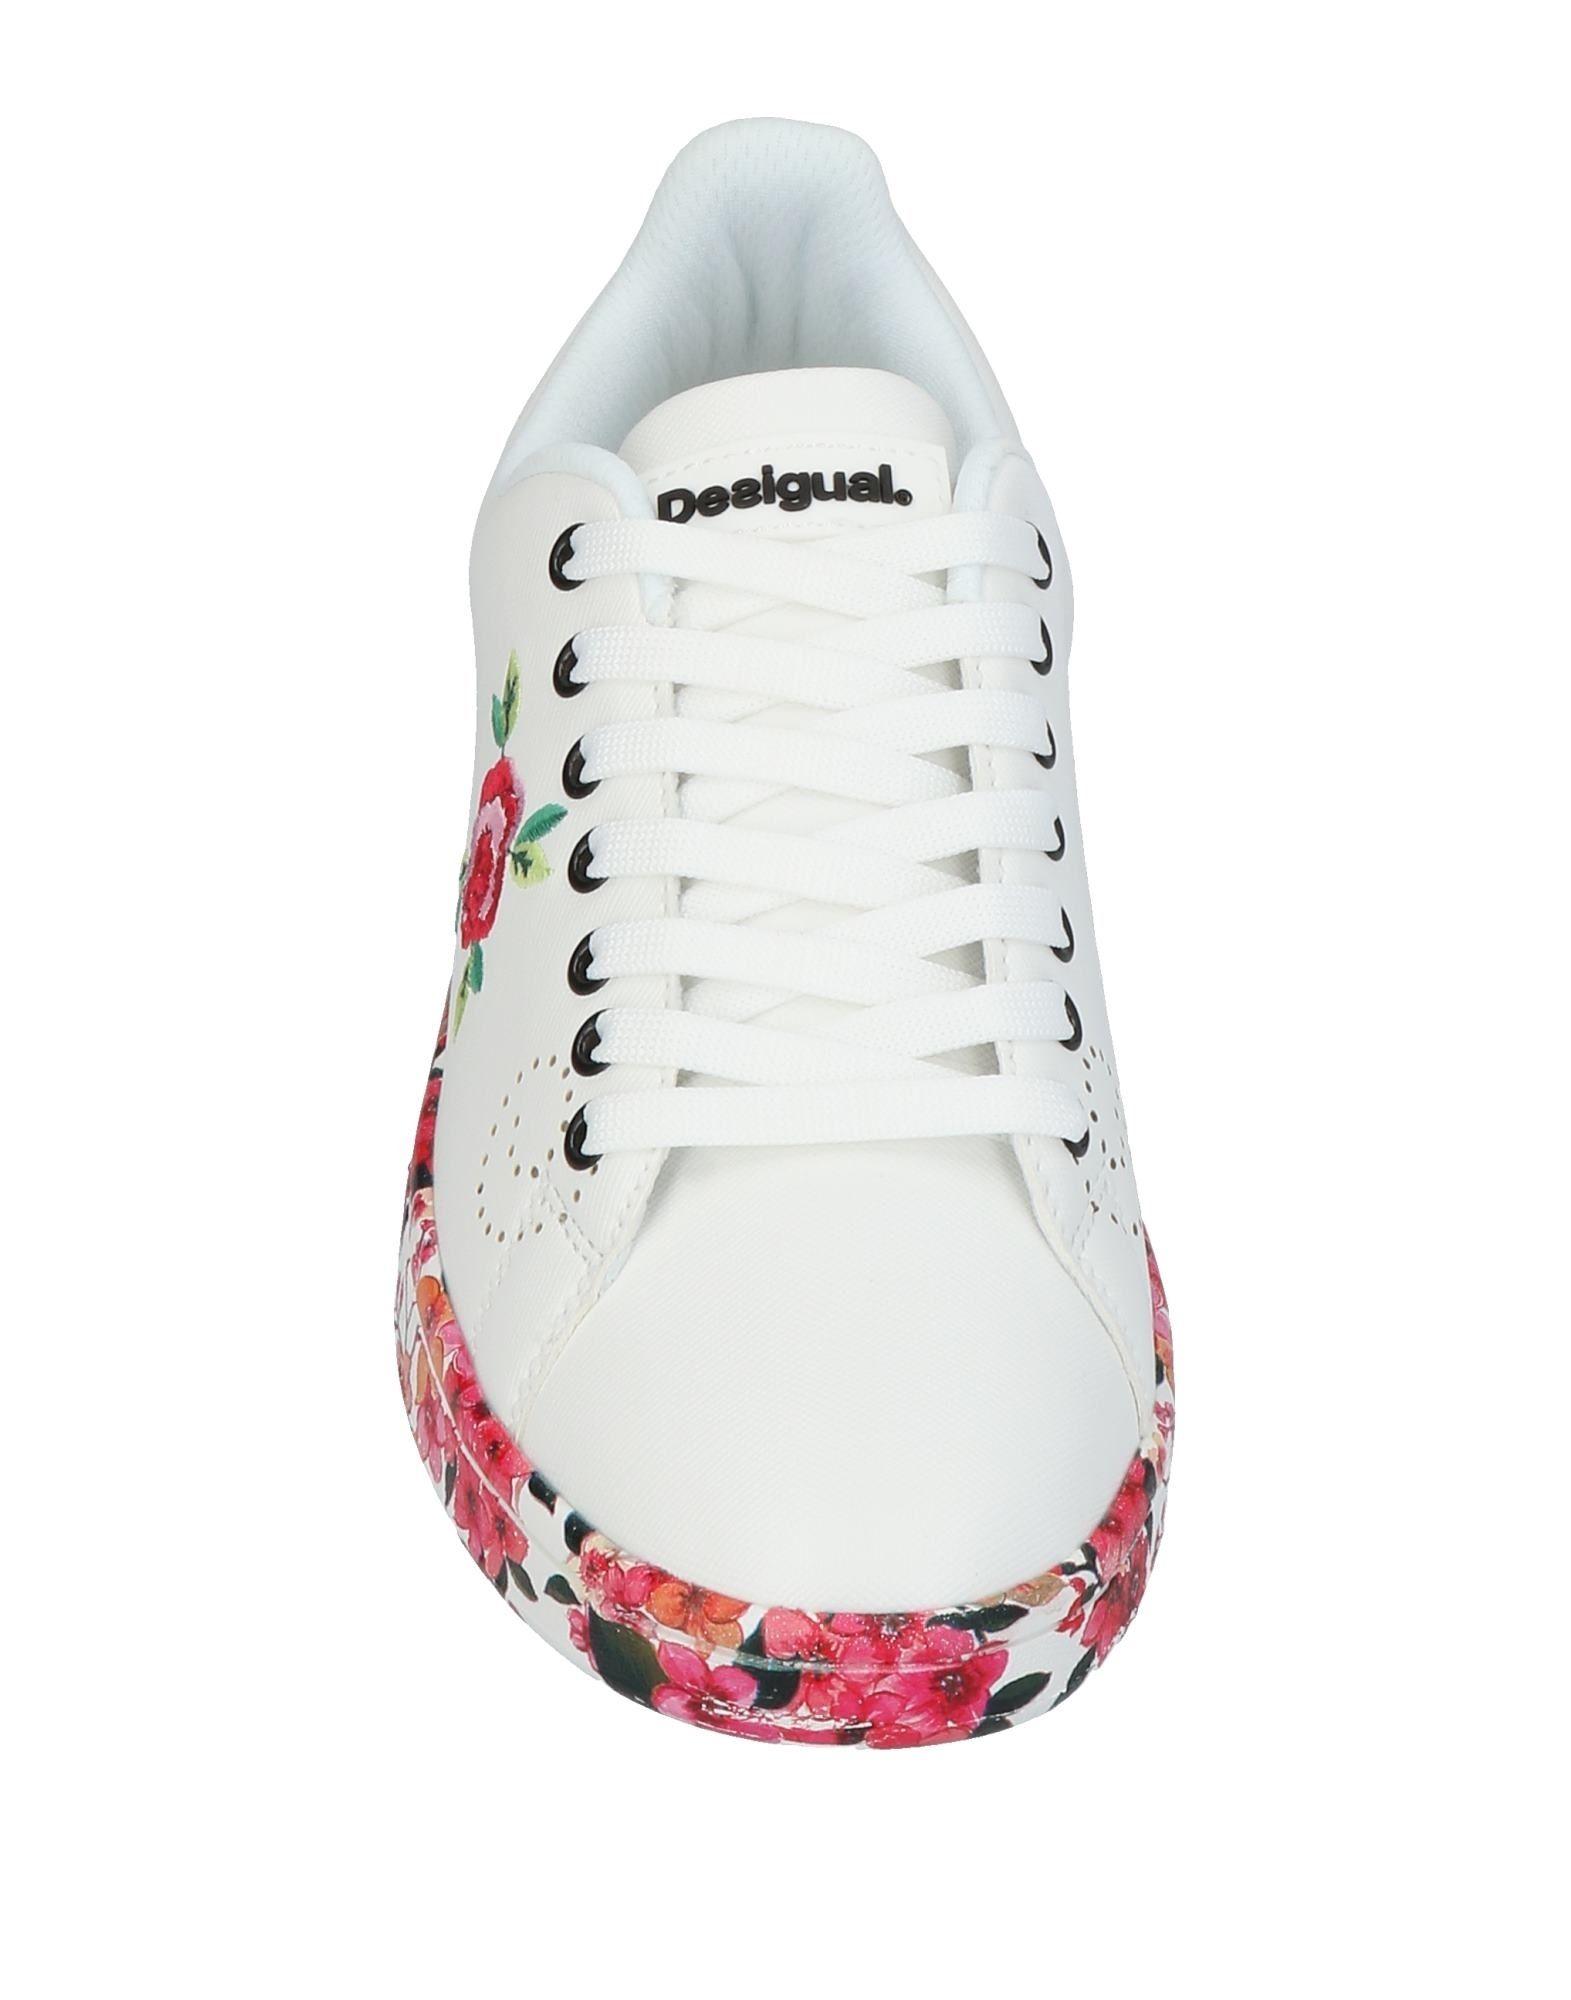 Desigual Sneakers  Damen  Sneakers 11439167VR Gute Qualität beliebte Schuhe 6ae206